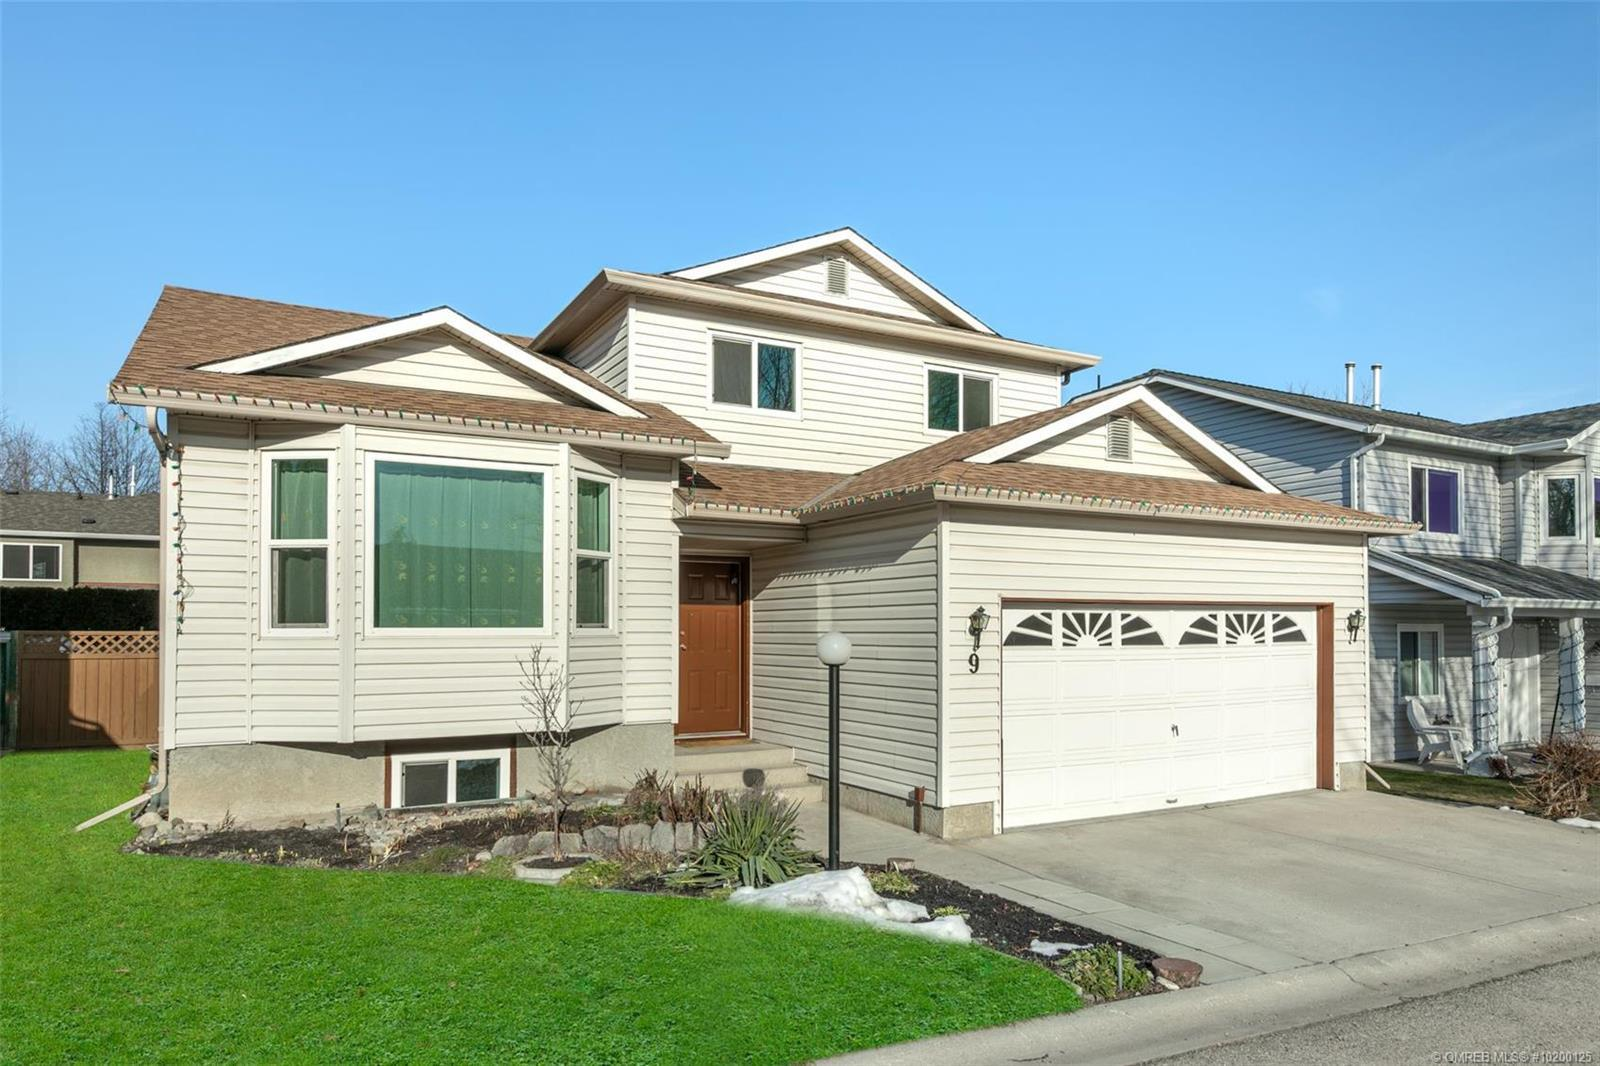 #9 555 Glenmeadows Road,, kelowna, British Columbia